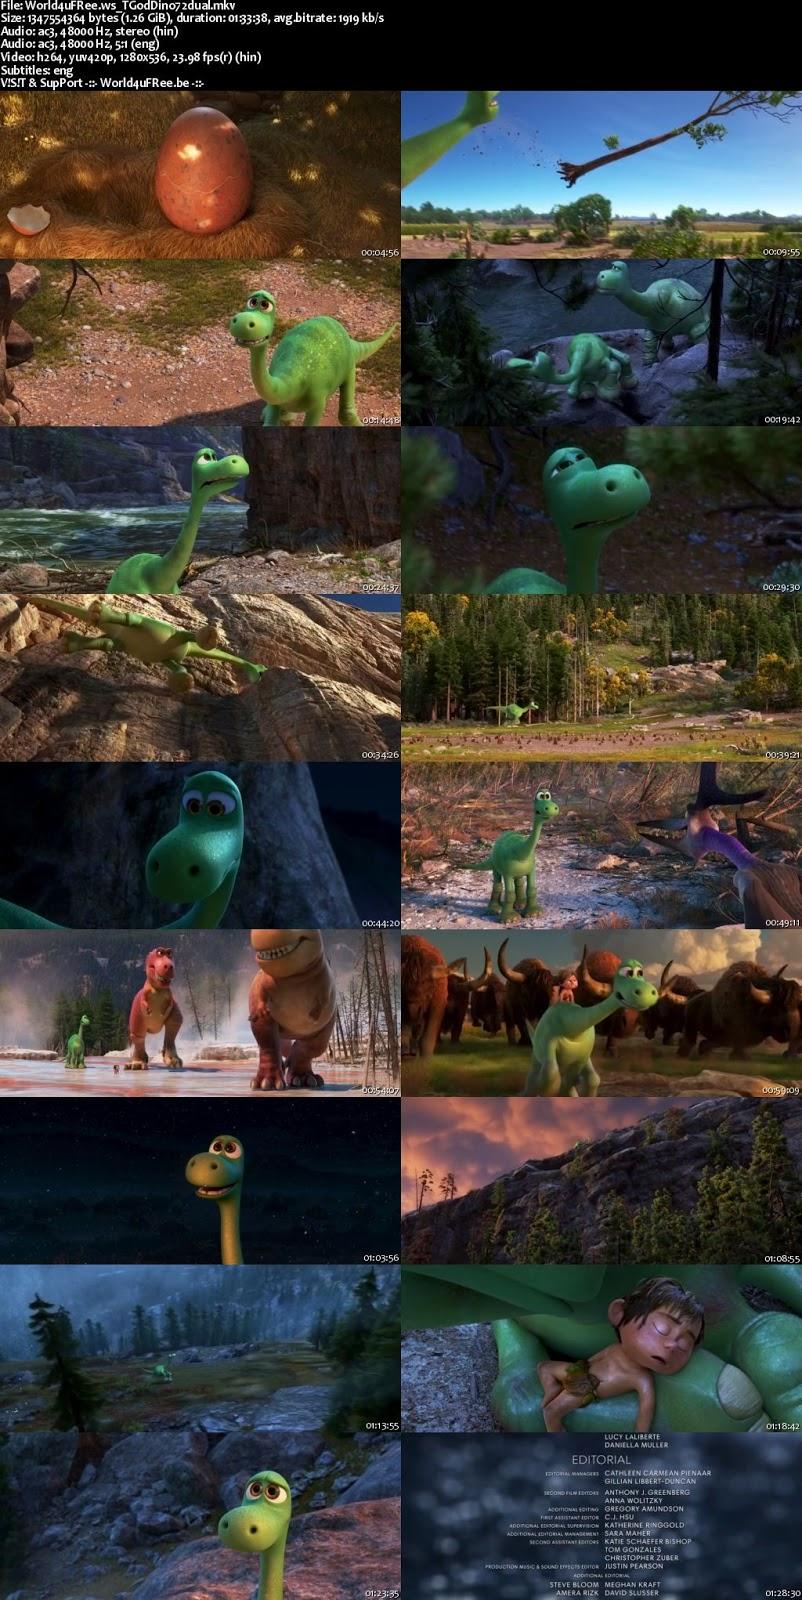 download the good dinosaur full movie in hindi torrent